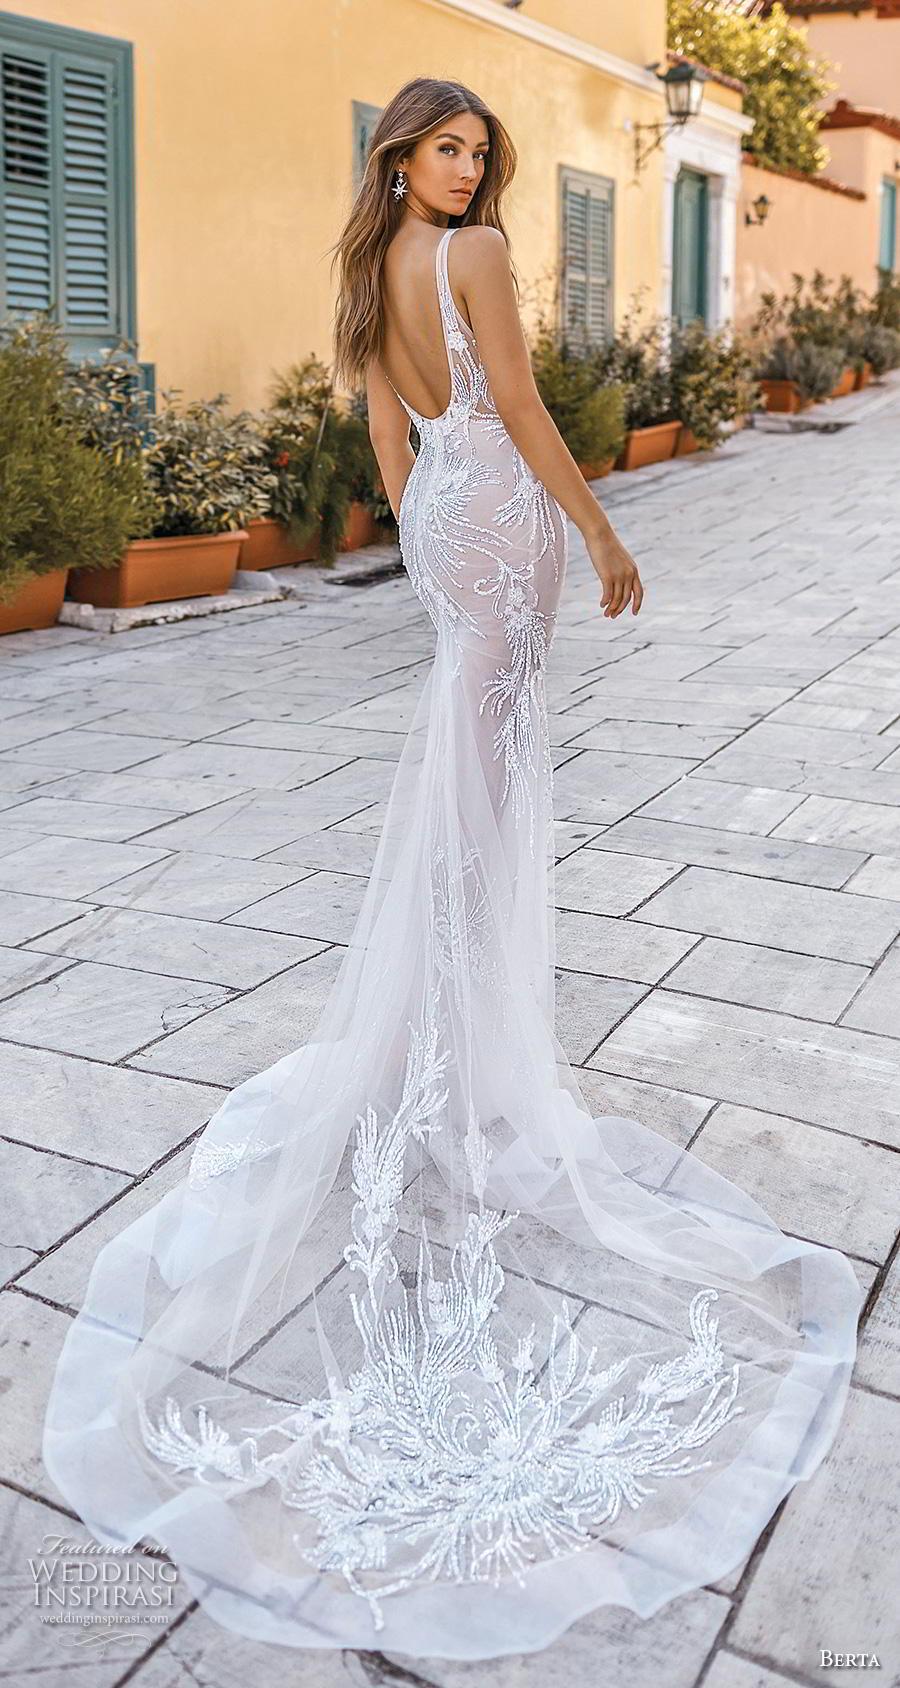 berta fall 2019 bridal sleeveless deep v neck heavily embellished bodice elegant glamorous fit and flare wedding dress open scoop back chapel train (17) bv